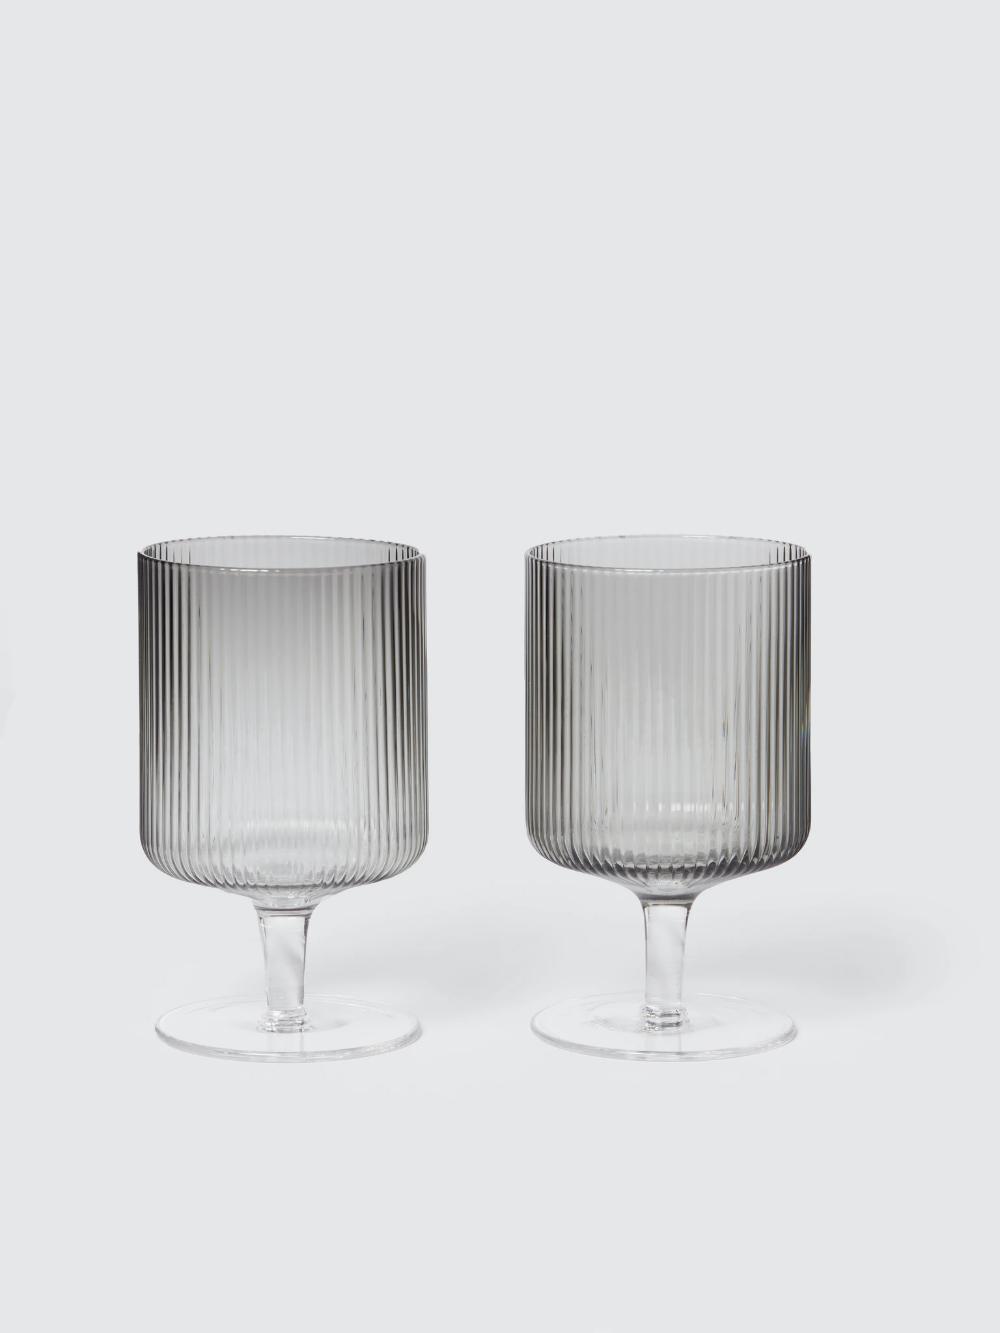 Ferm Living Ripple Wine Glasses Set Of 2 In 2020 Glass Suppliers Glasses Drinking Wine Glasses